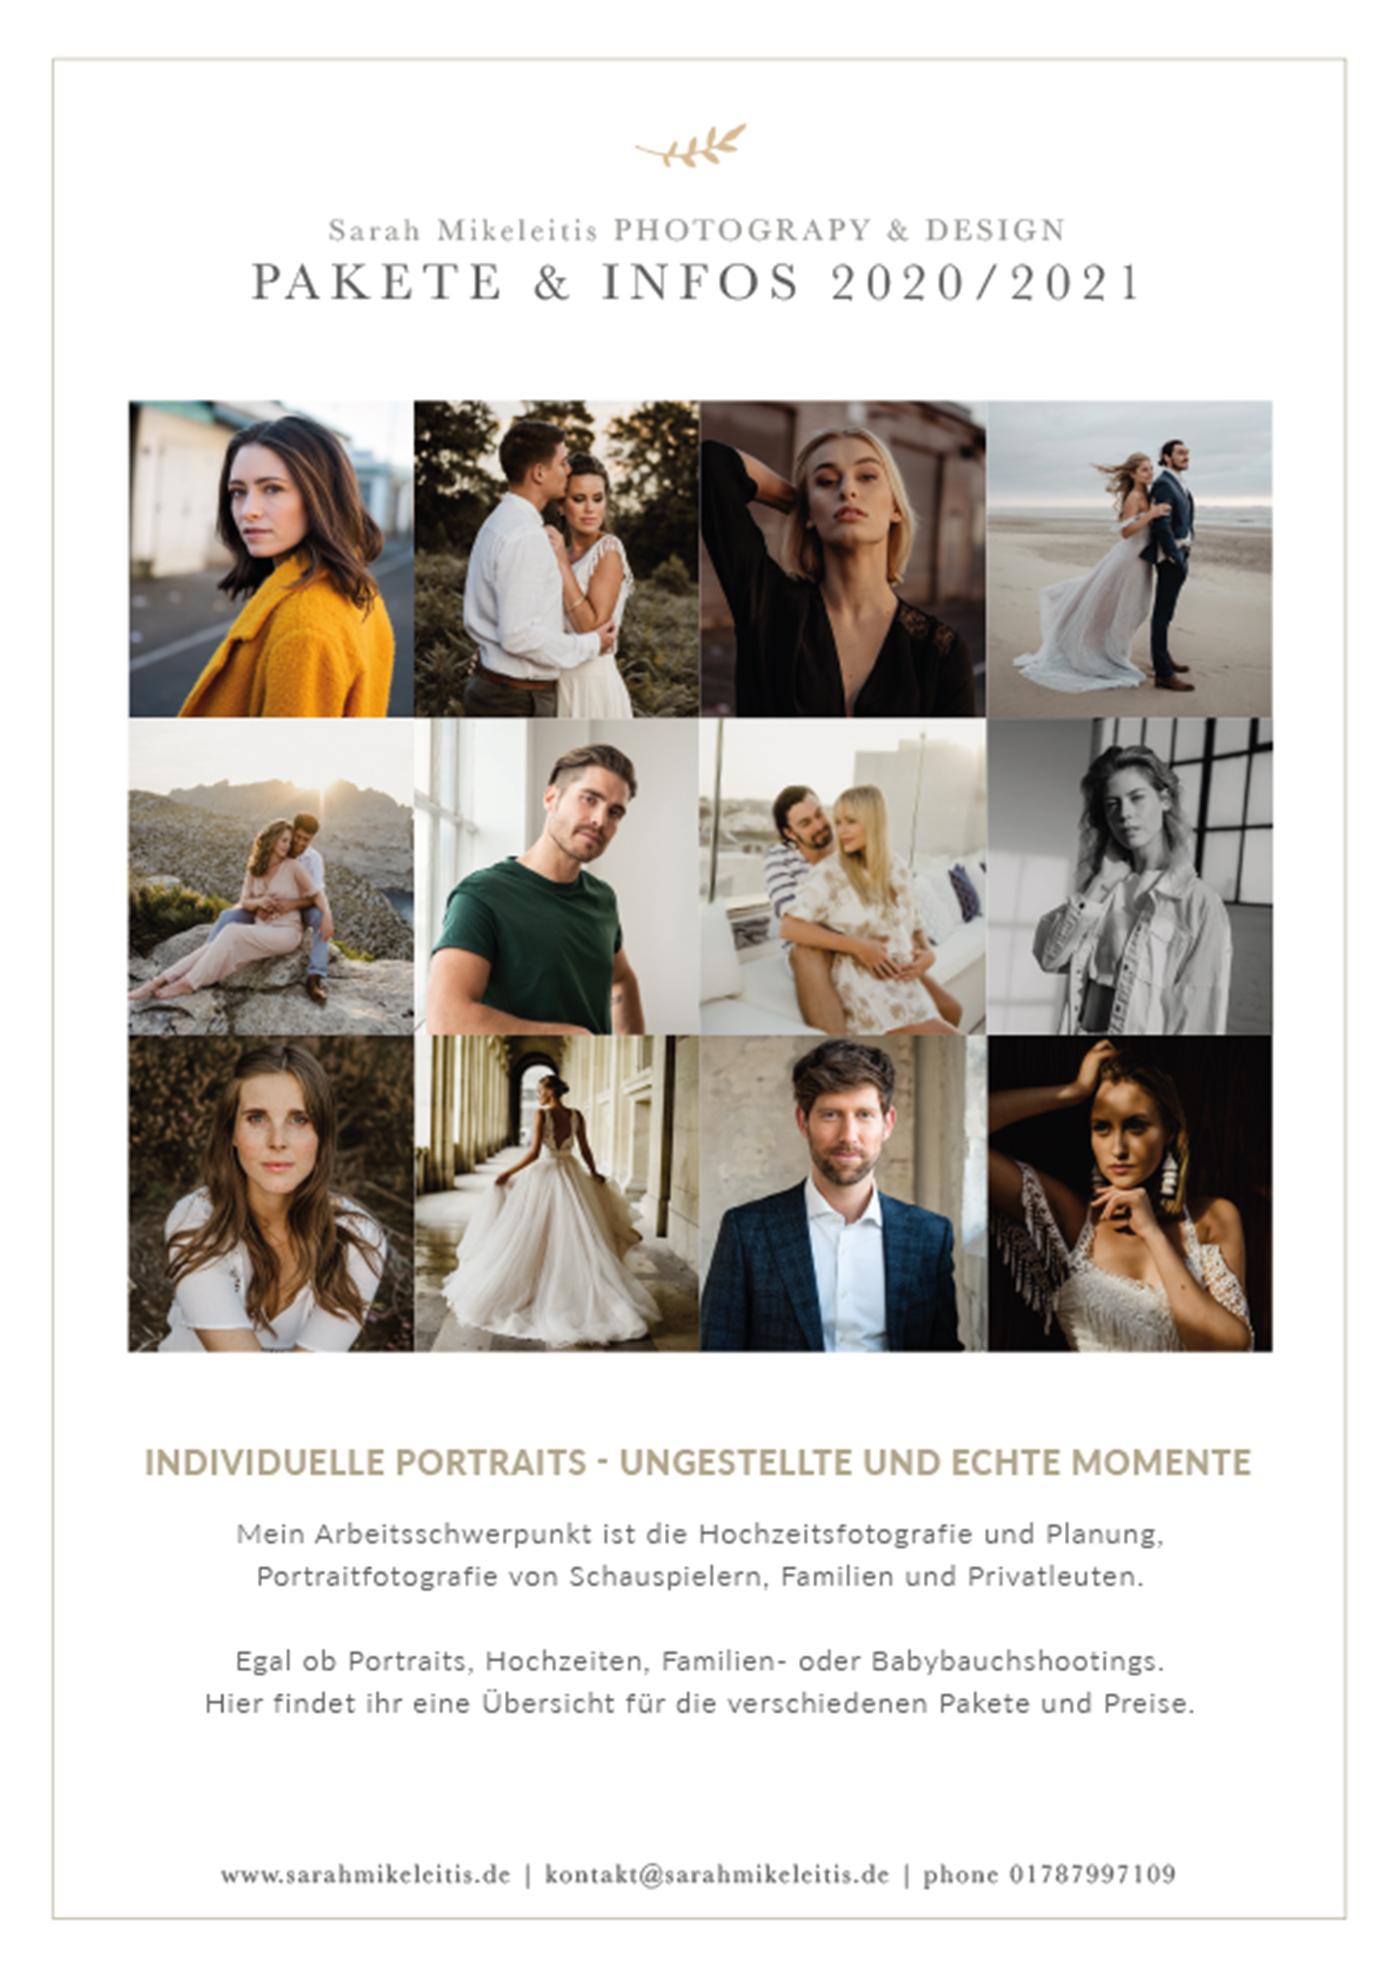 Preisliste für Portraitshootings